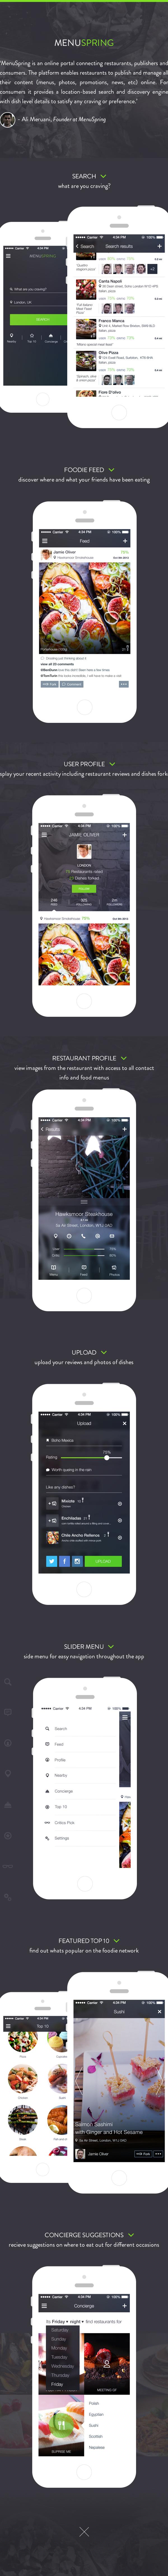 app ios7 menu Food  reviews profile social network sharing